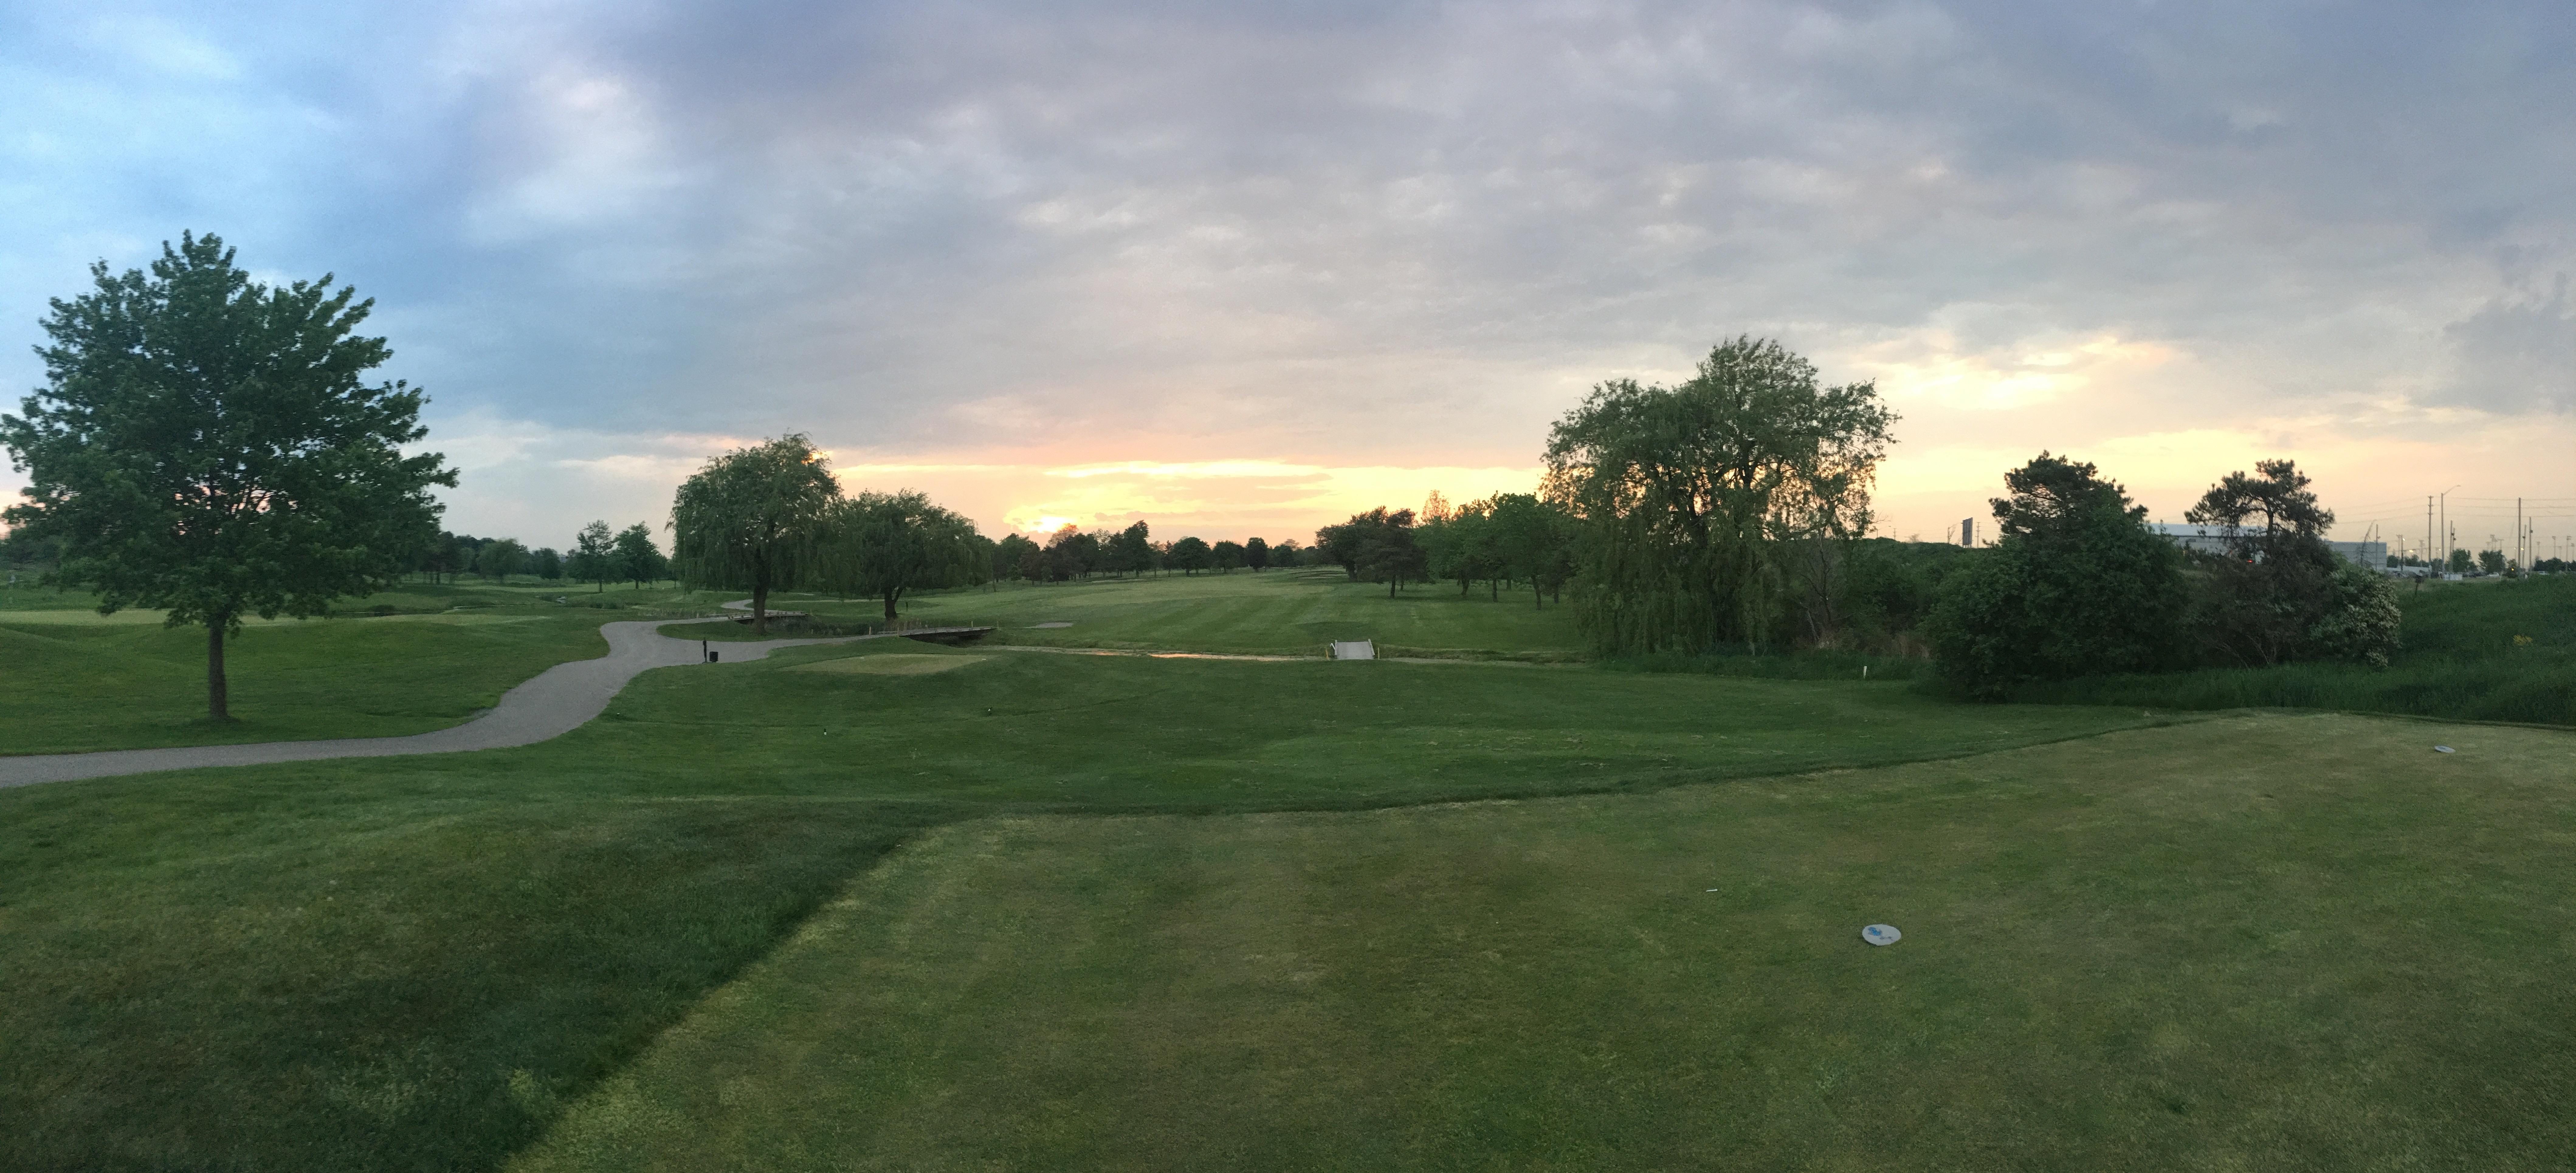 CJGA (Canadian Junior Golf Association) Charity Golf Tournament on Sept 17 gallery image #8